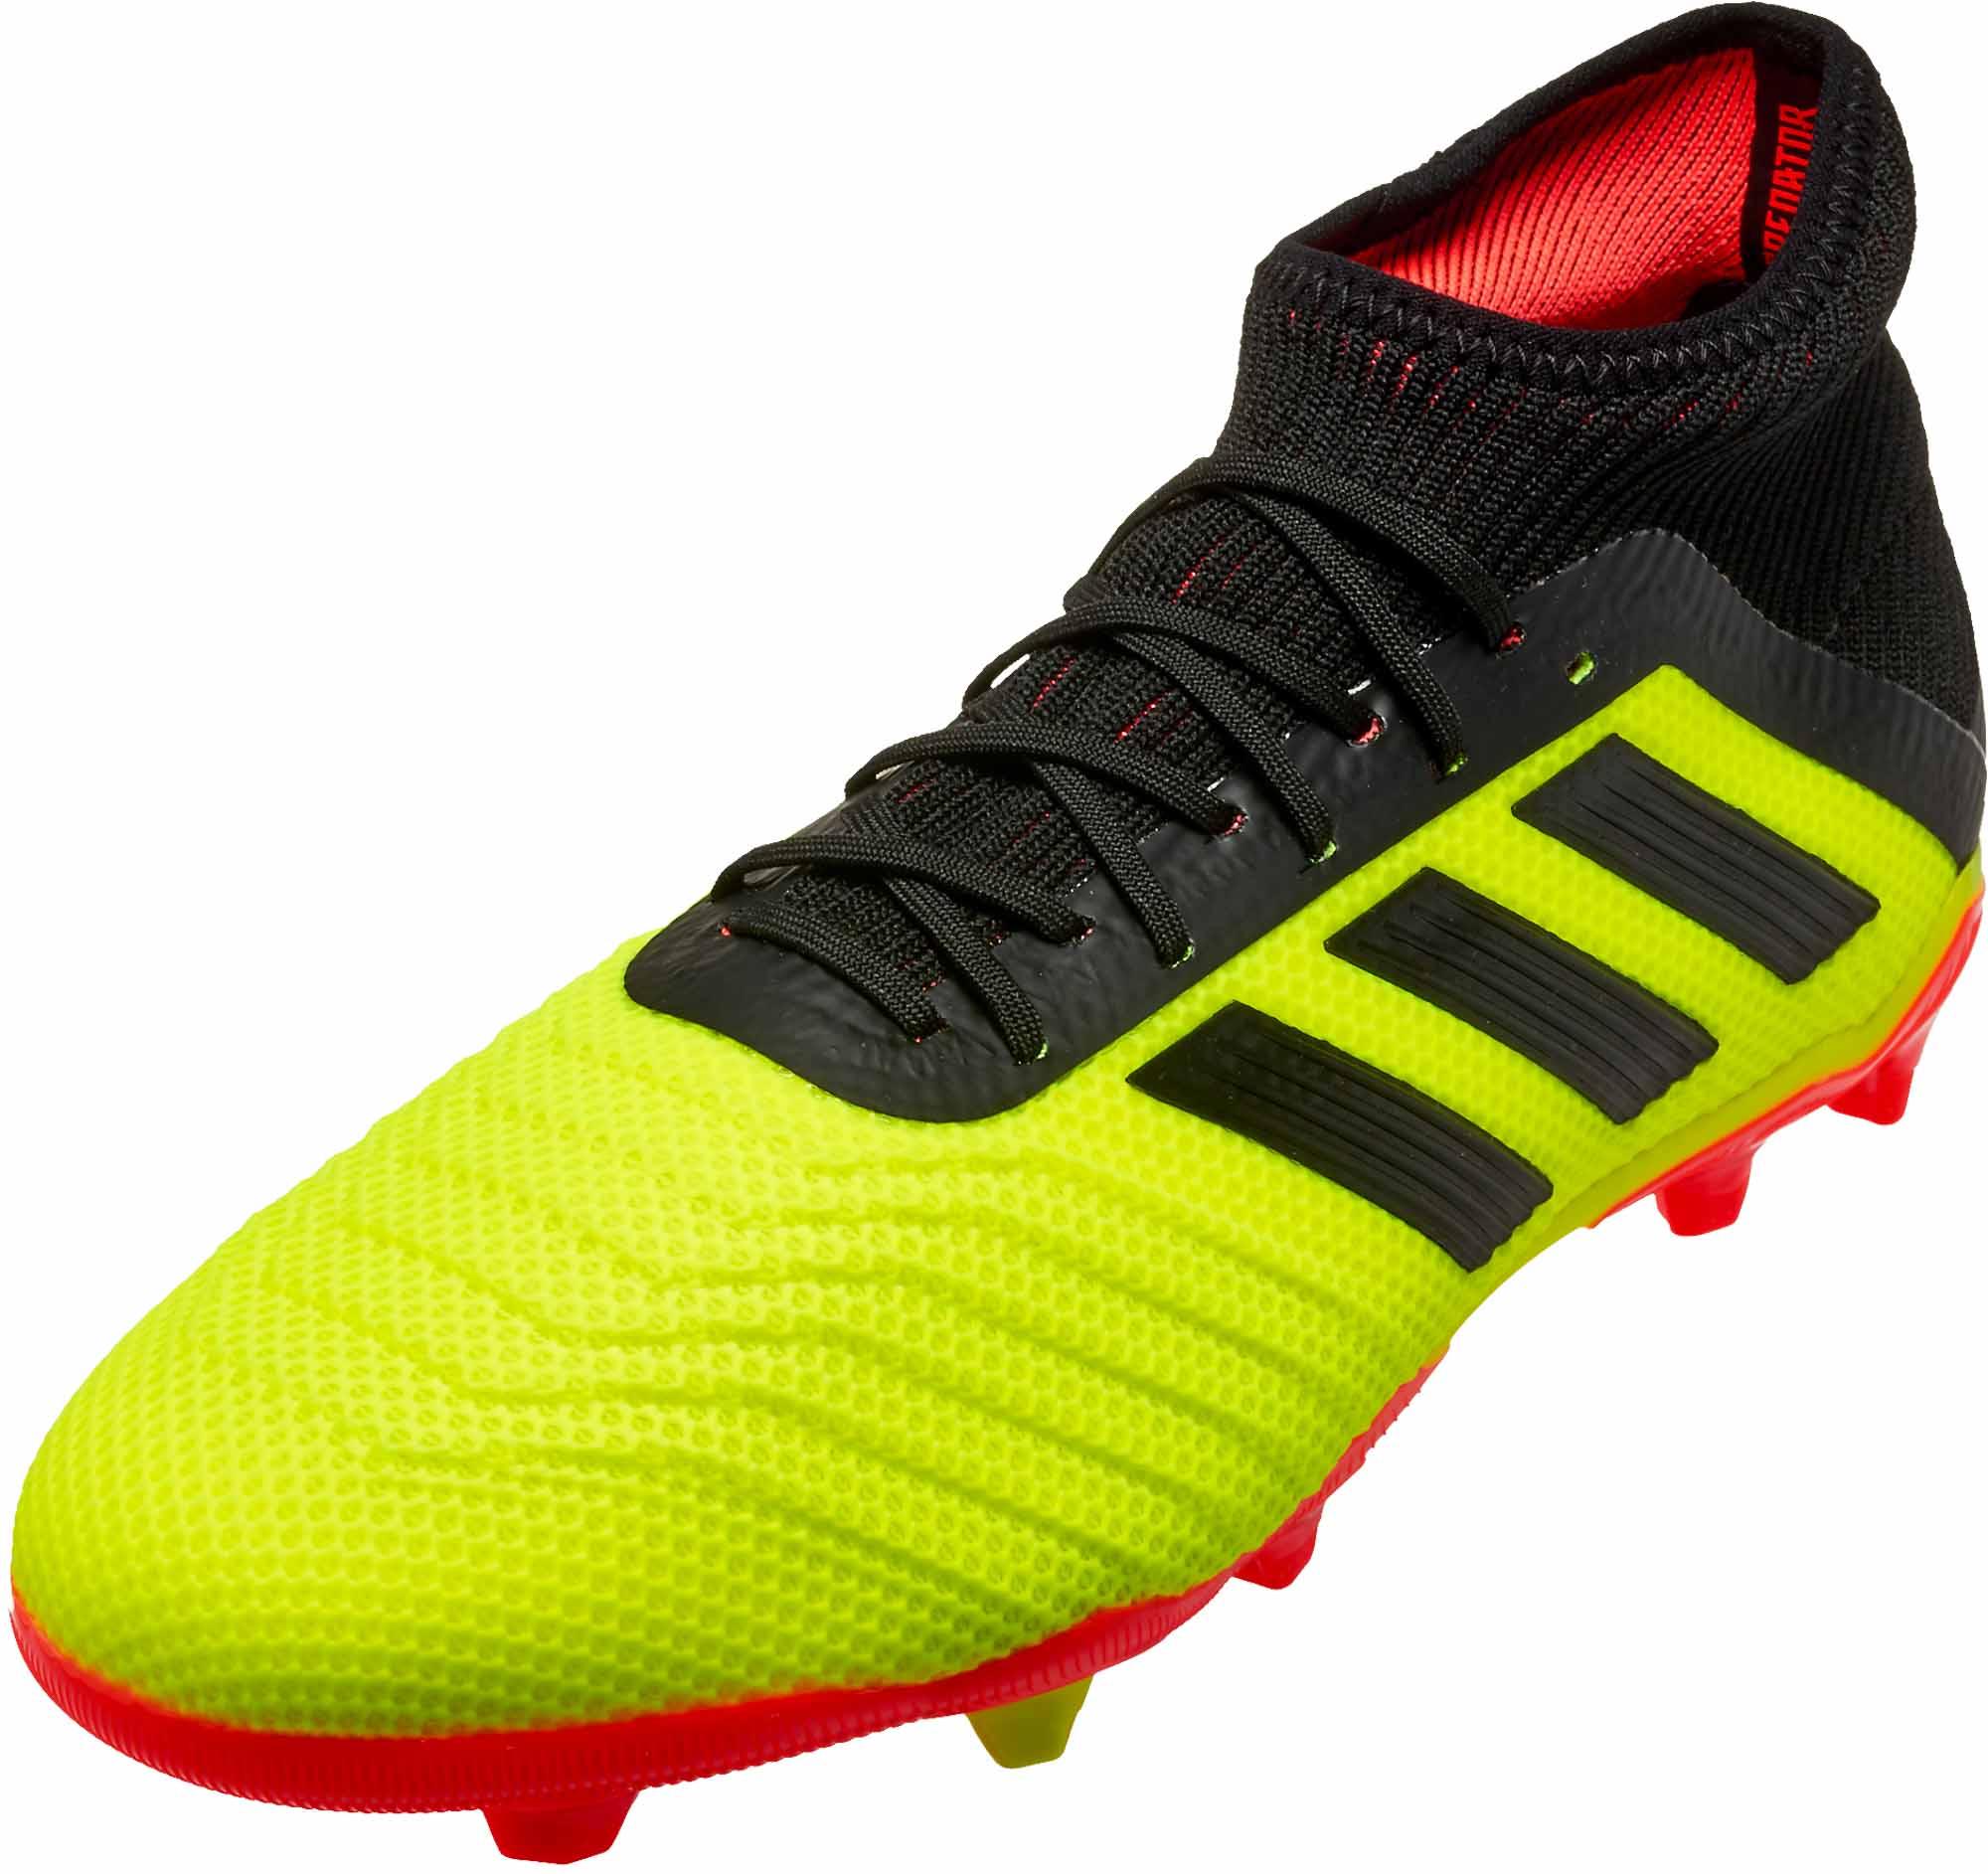 15bd587949b Kids adidas Predator 18.1 FG - Energy Mode - SoccerPro